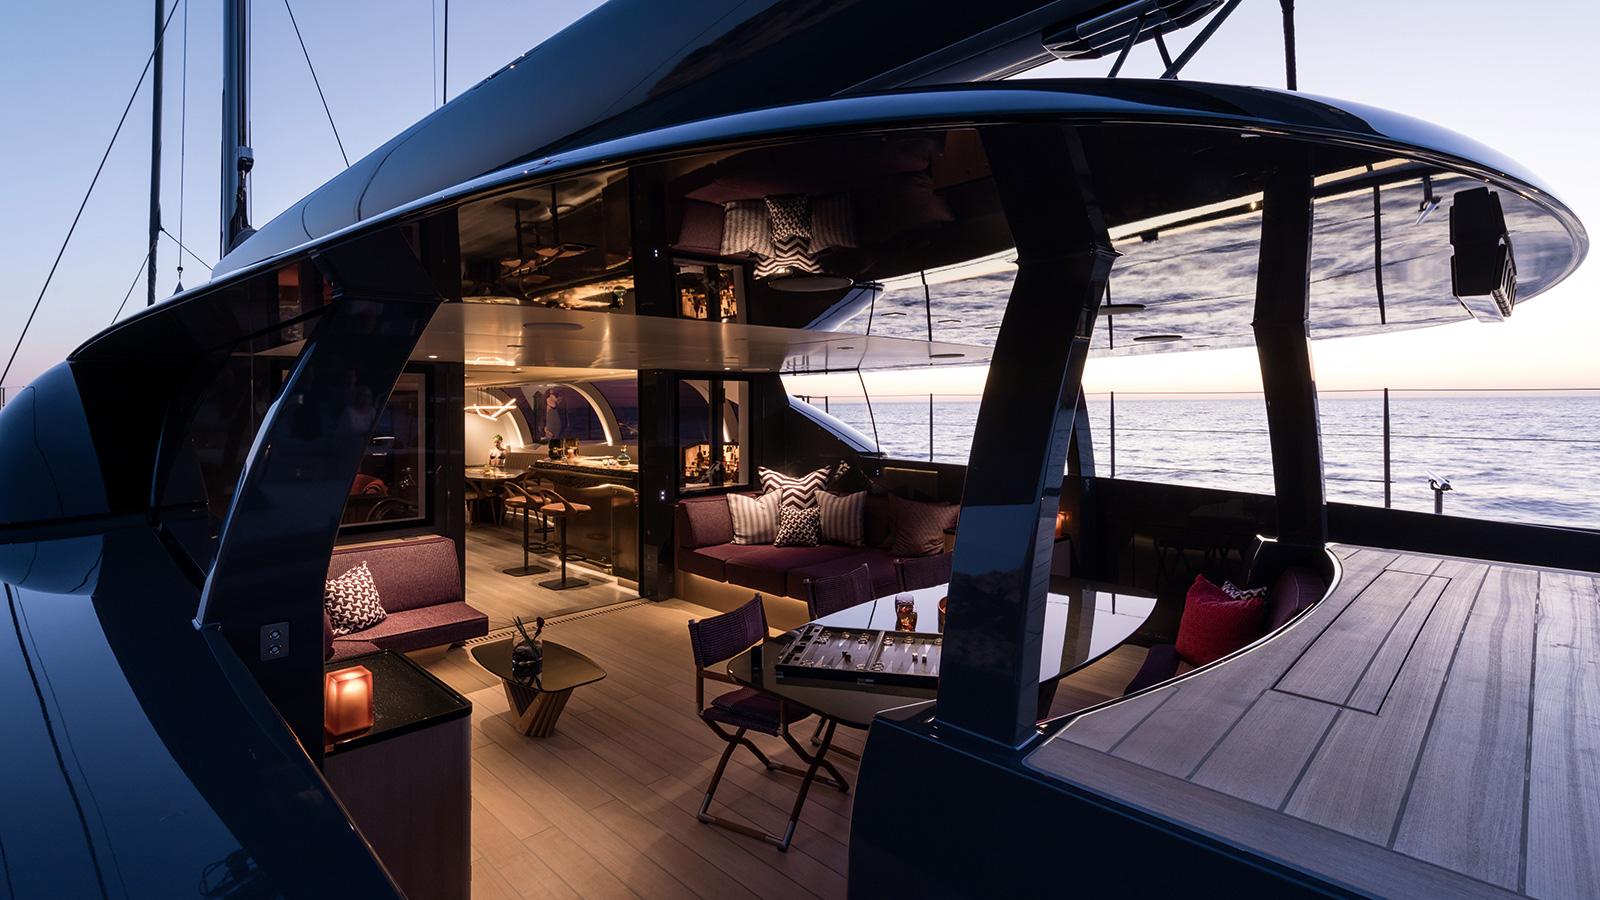 the-cockpit-of-the-royal-huisman-sailing-yacht-ngoni-credit-jeff-brown-breed-media